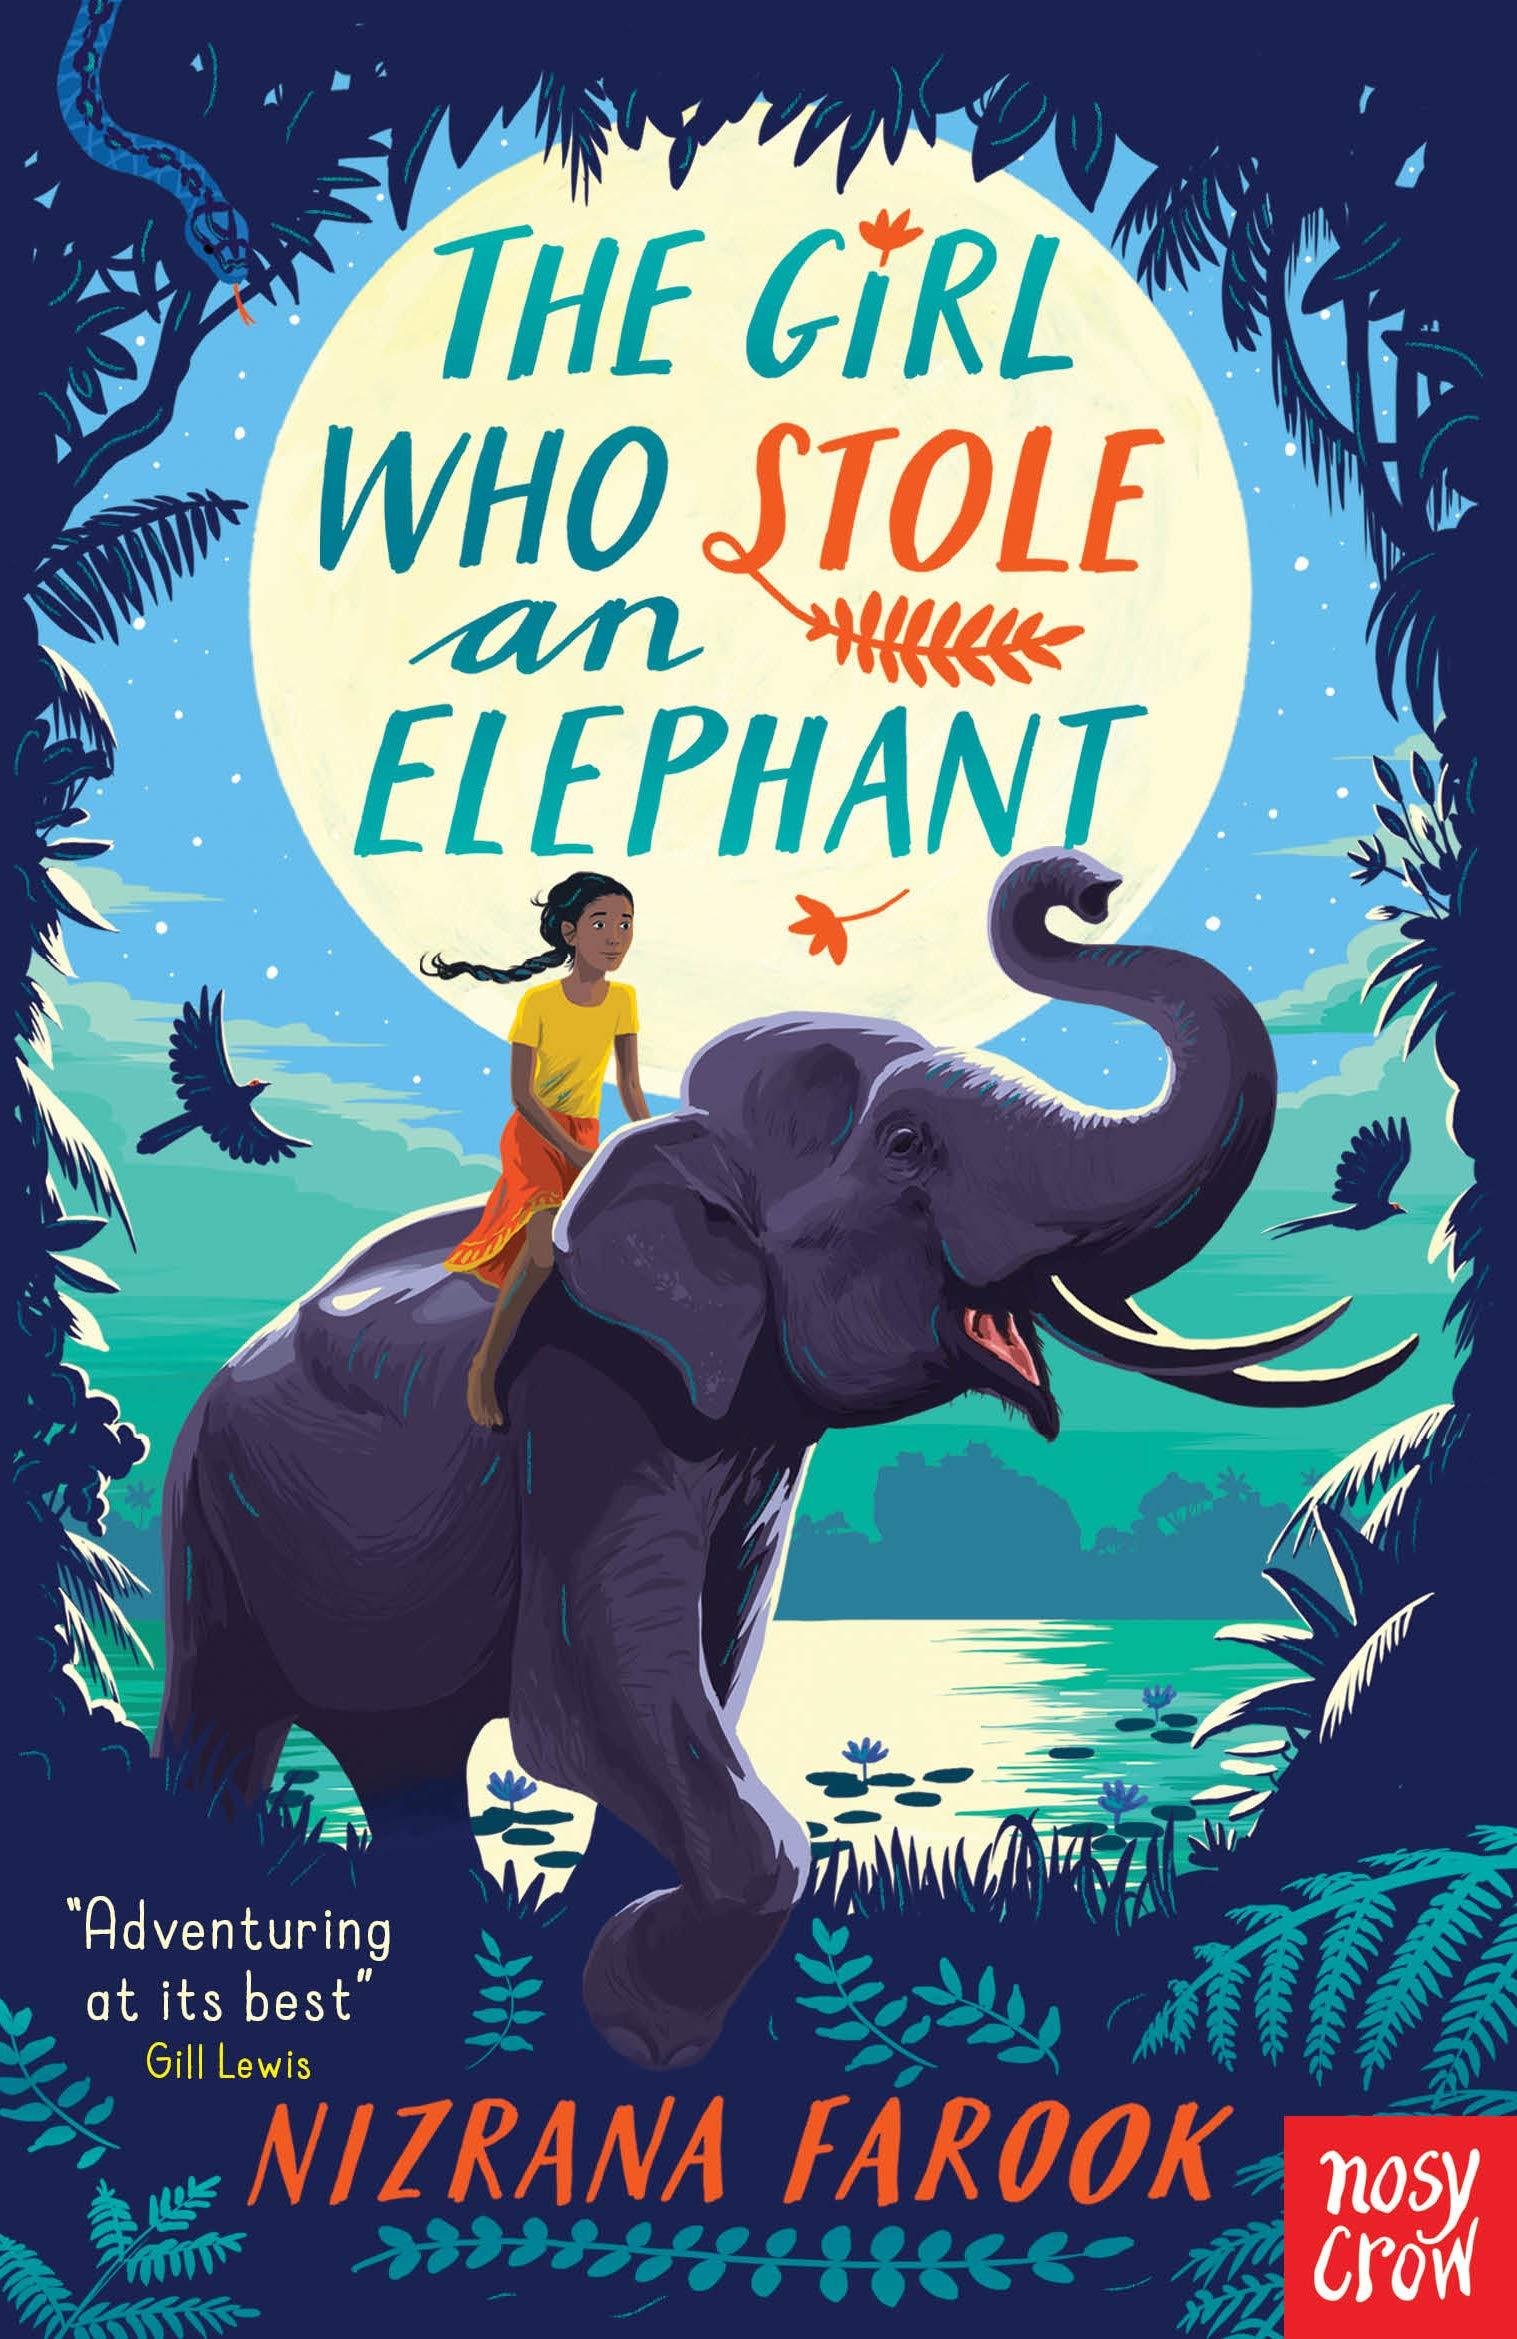 Book cover image for The Girl Who Stole an Elephant by Nizrana Farook